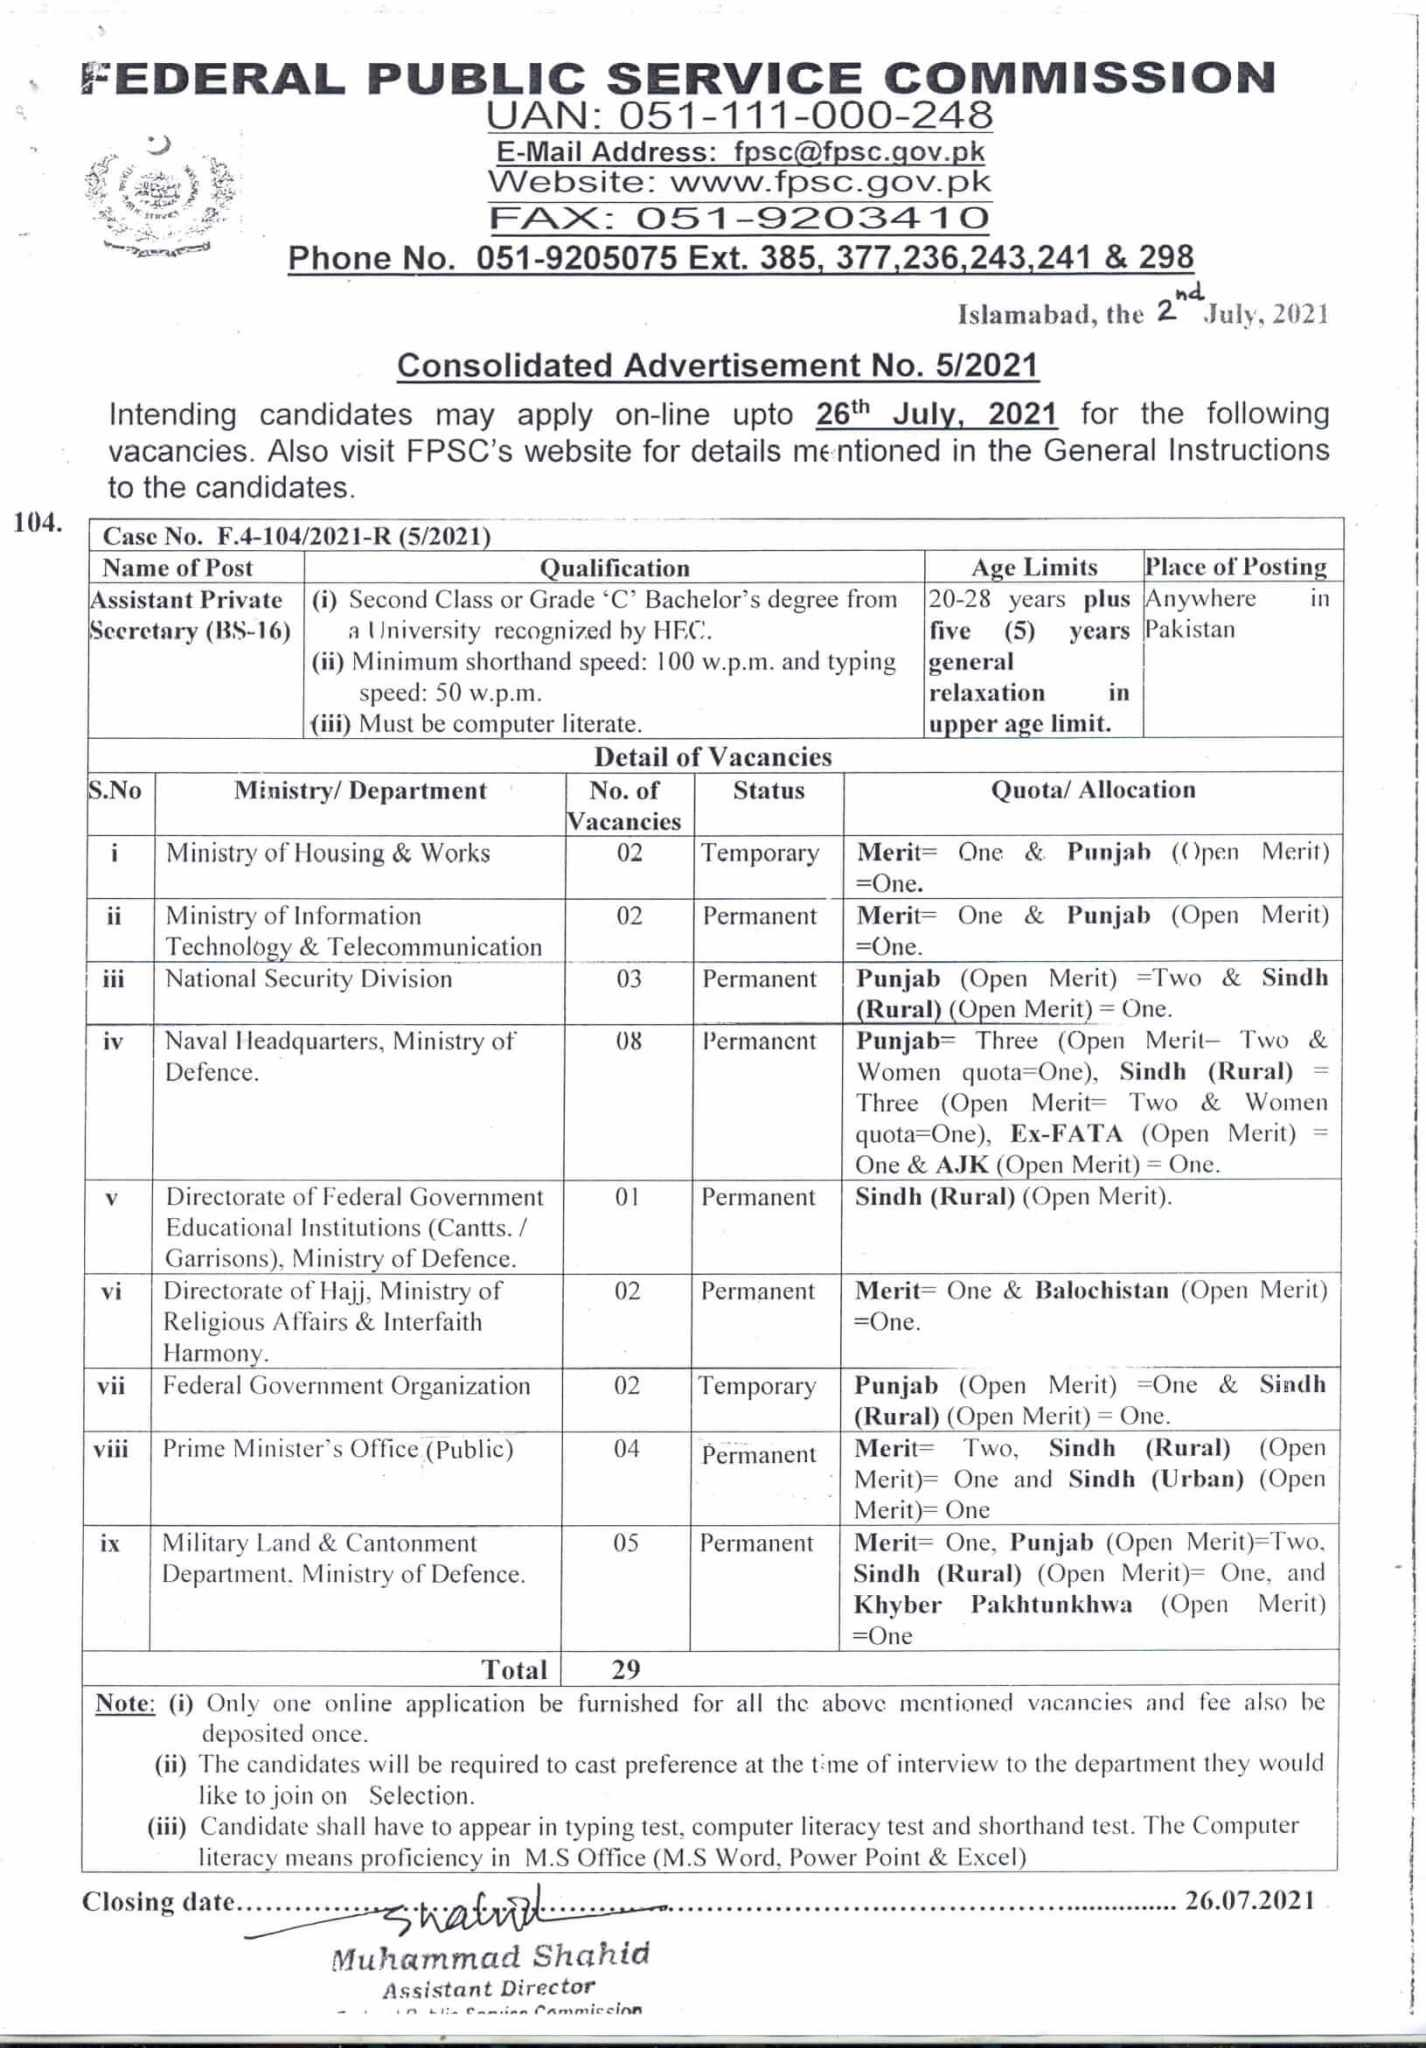 FPSC Jobs Advertisement 05-2021 Apply Online fpsc.gov.pk